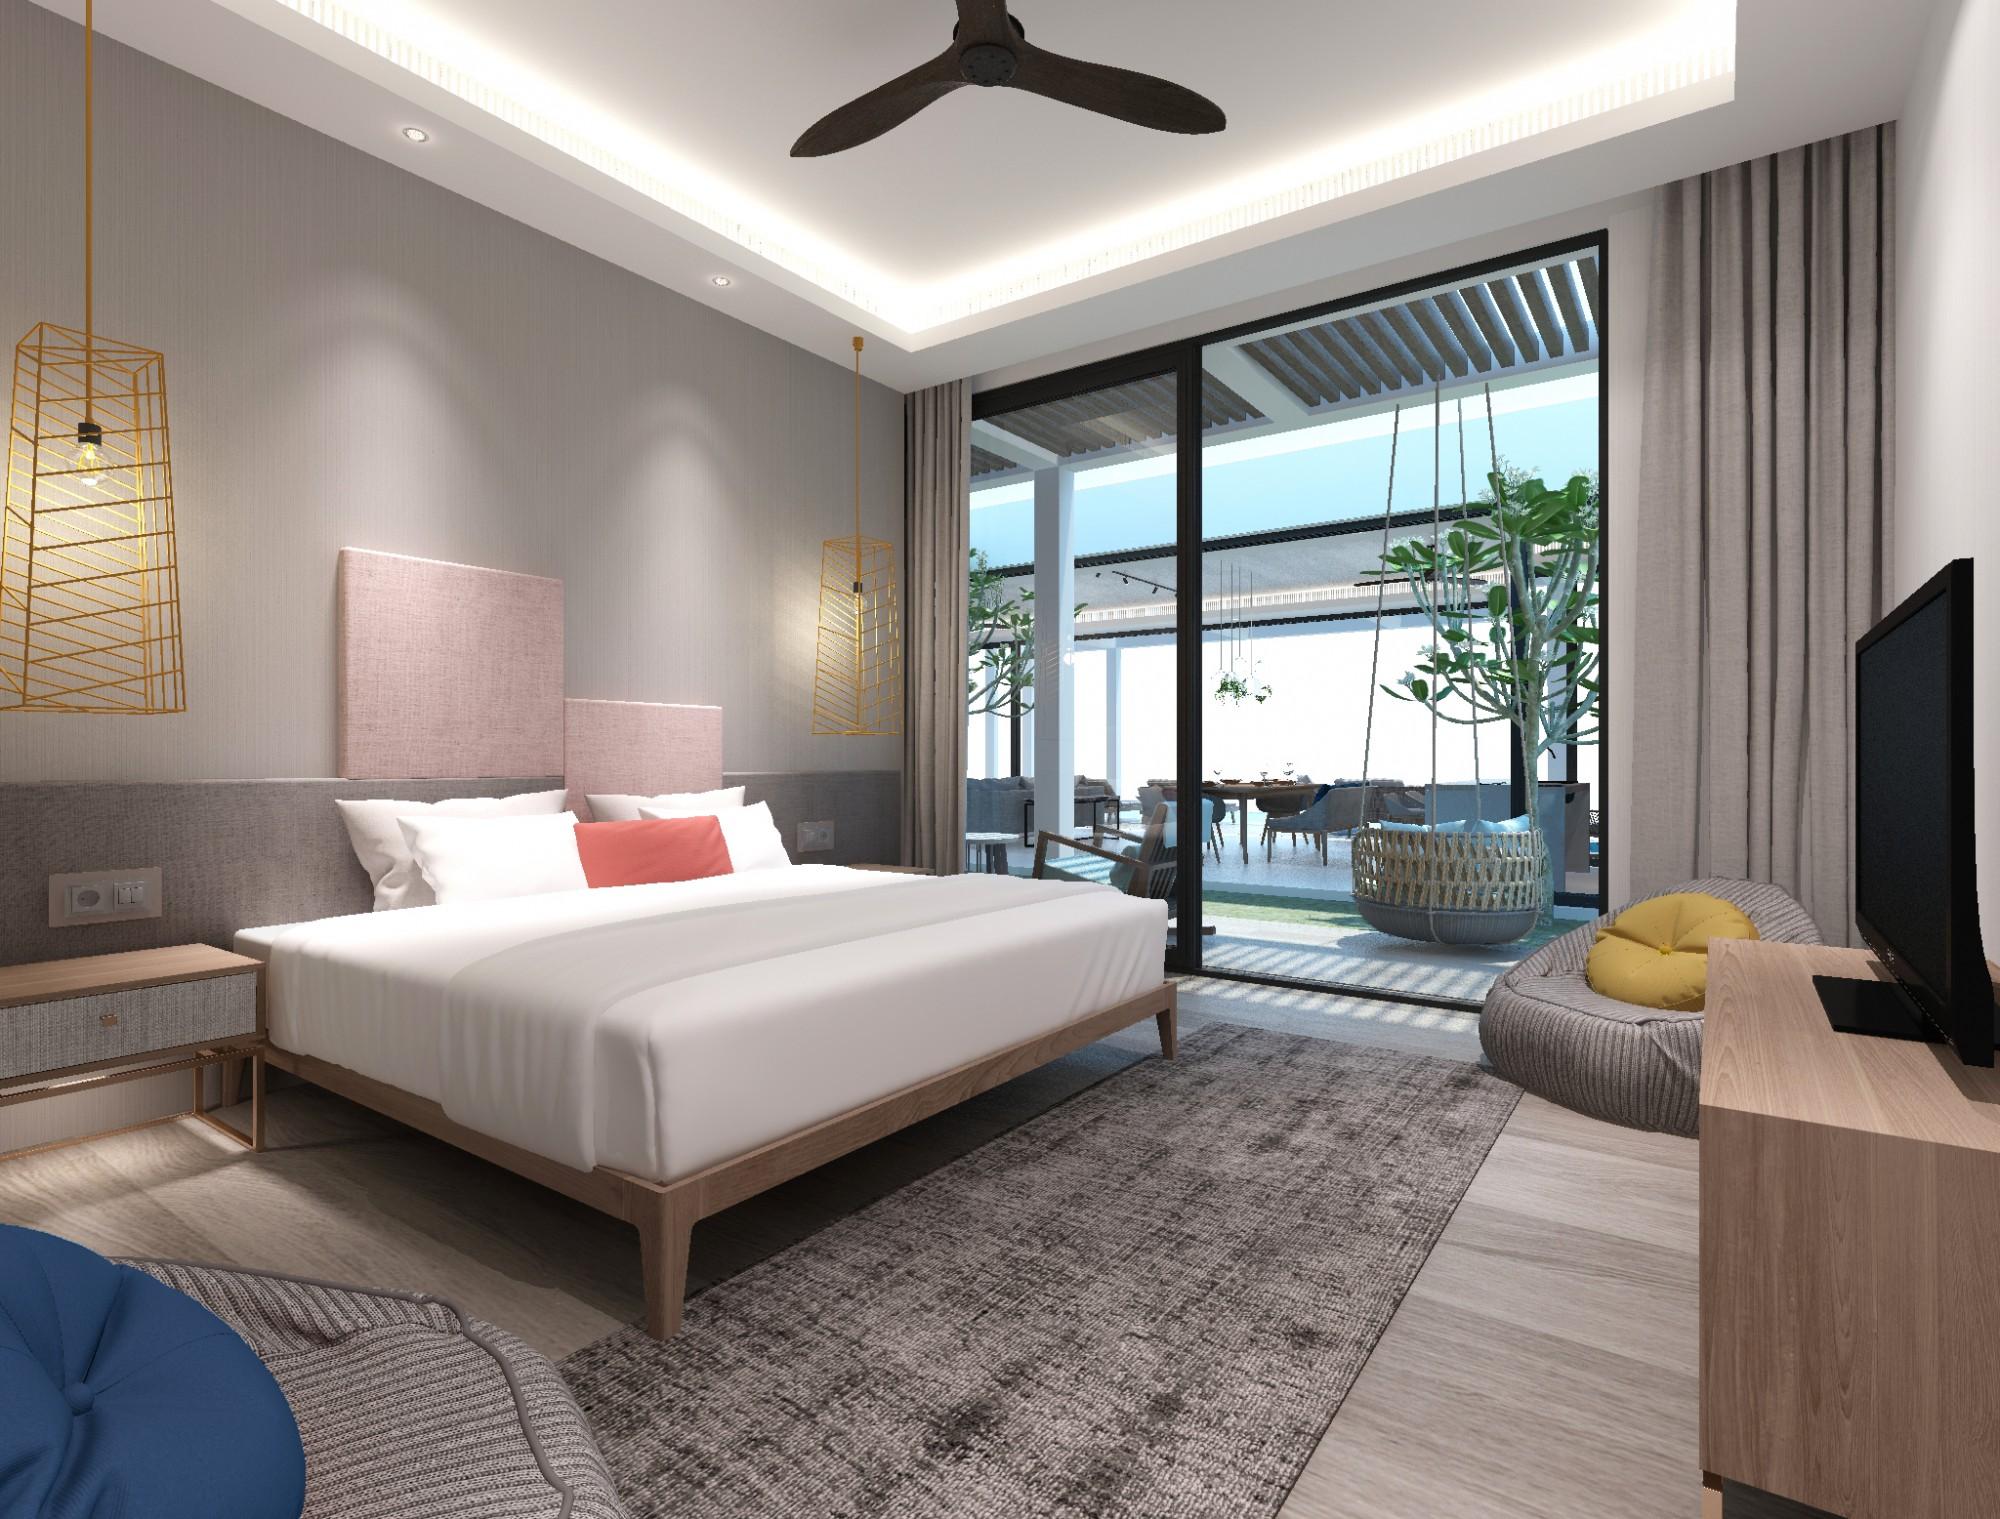 https://www.otdesign.com/wp-content/uploads/2020/11/OTdesign_Mandarin_Oriental_Bali_Residences_alt-2-a-1.jpg